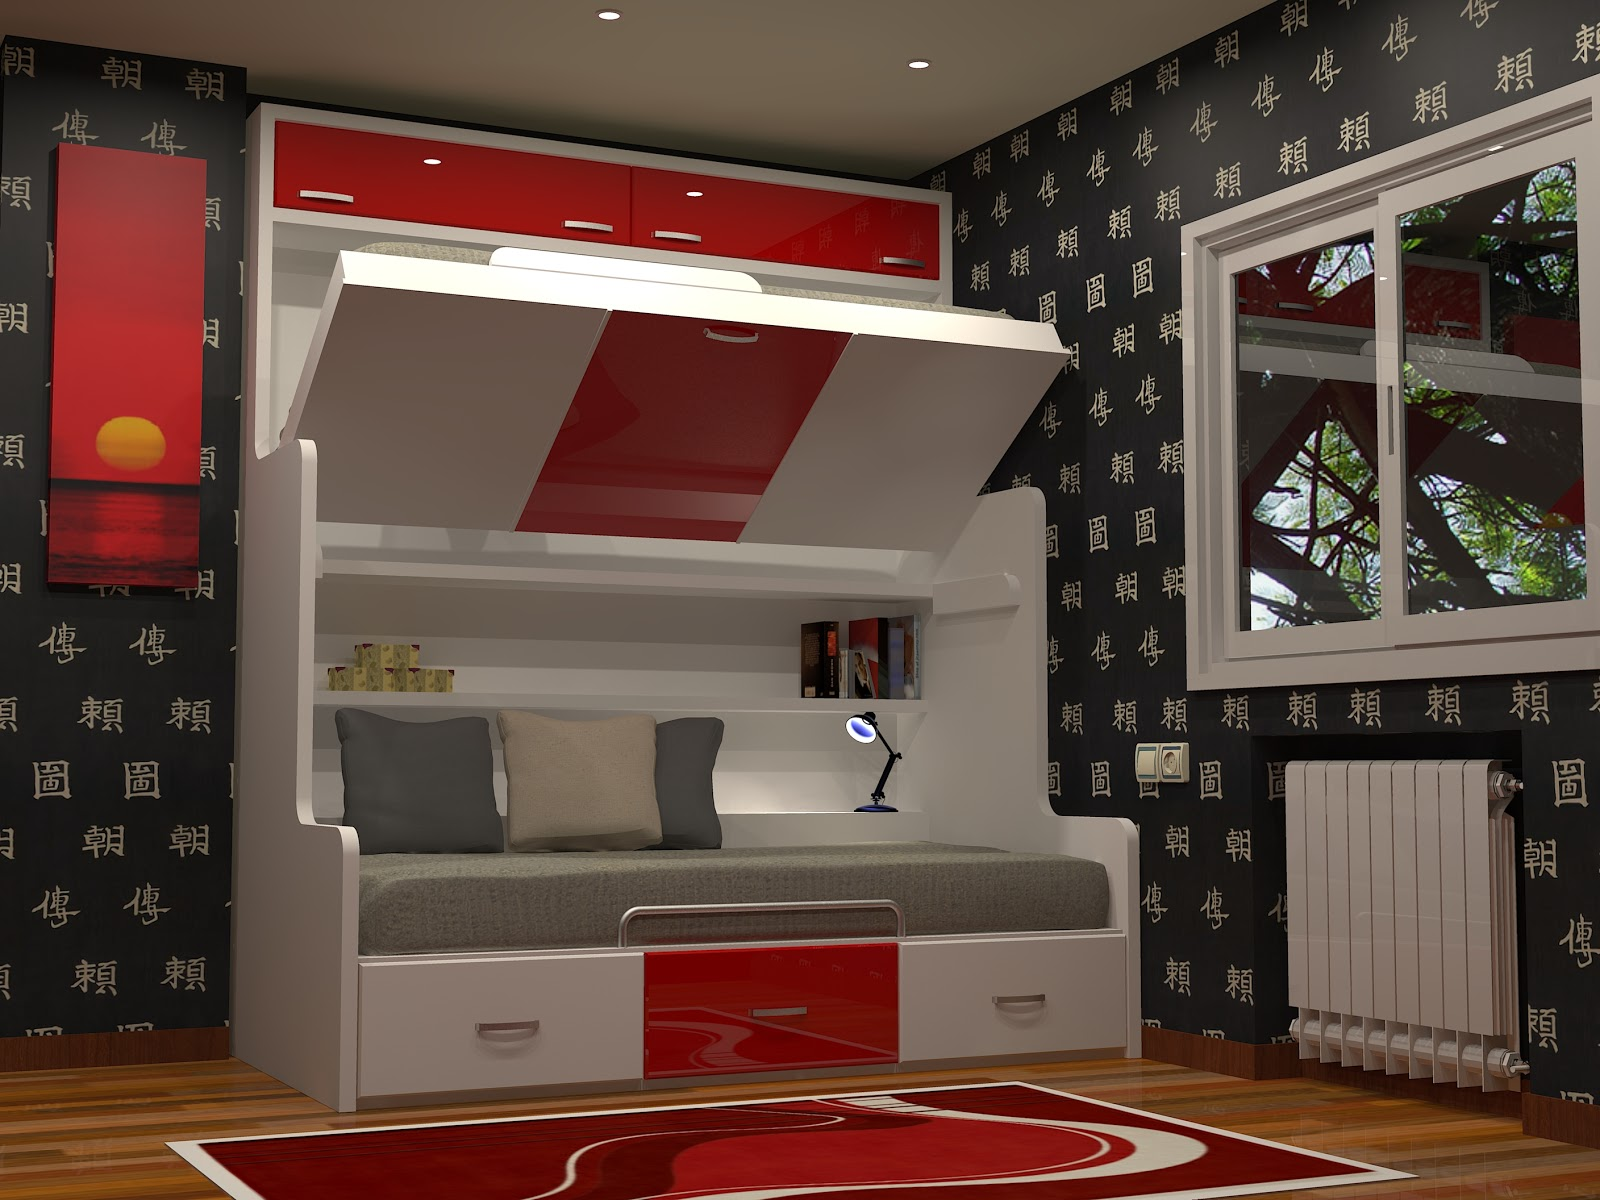 litera nido abatible mueble litera nido abatible litera divan cama convertible dormitorios juveniles para espacios reducidos